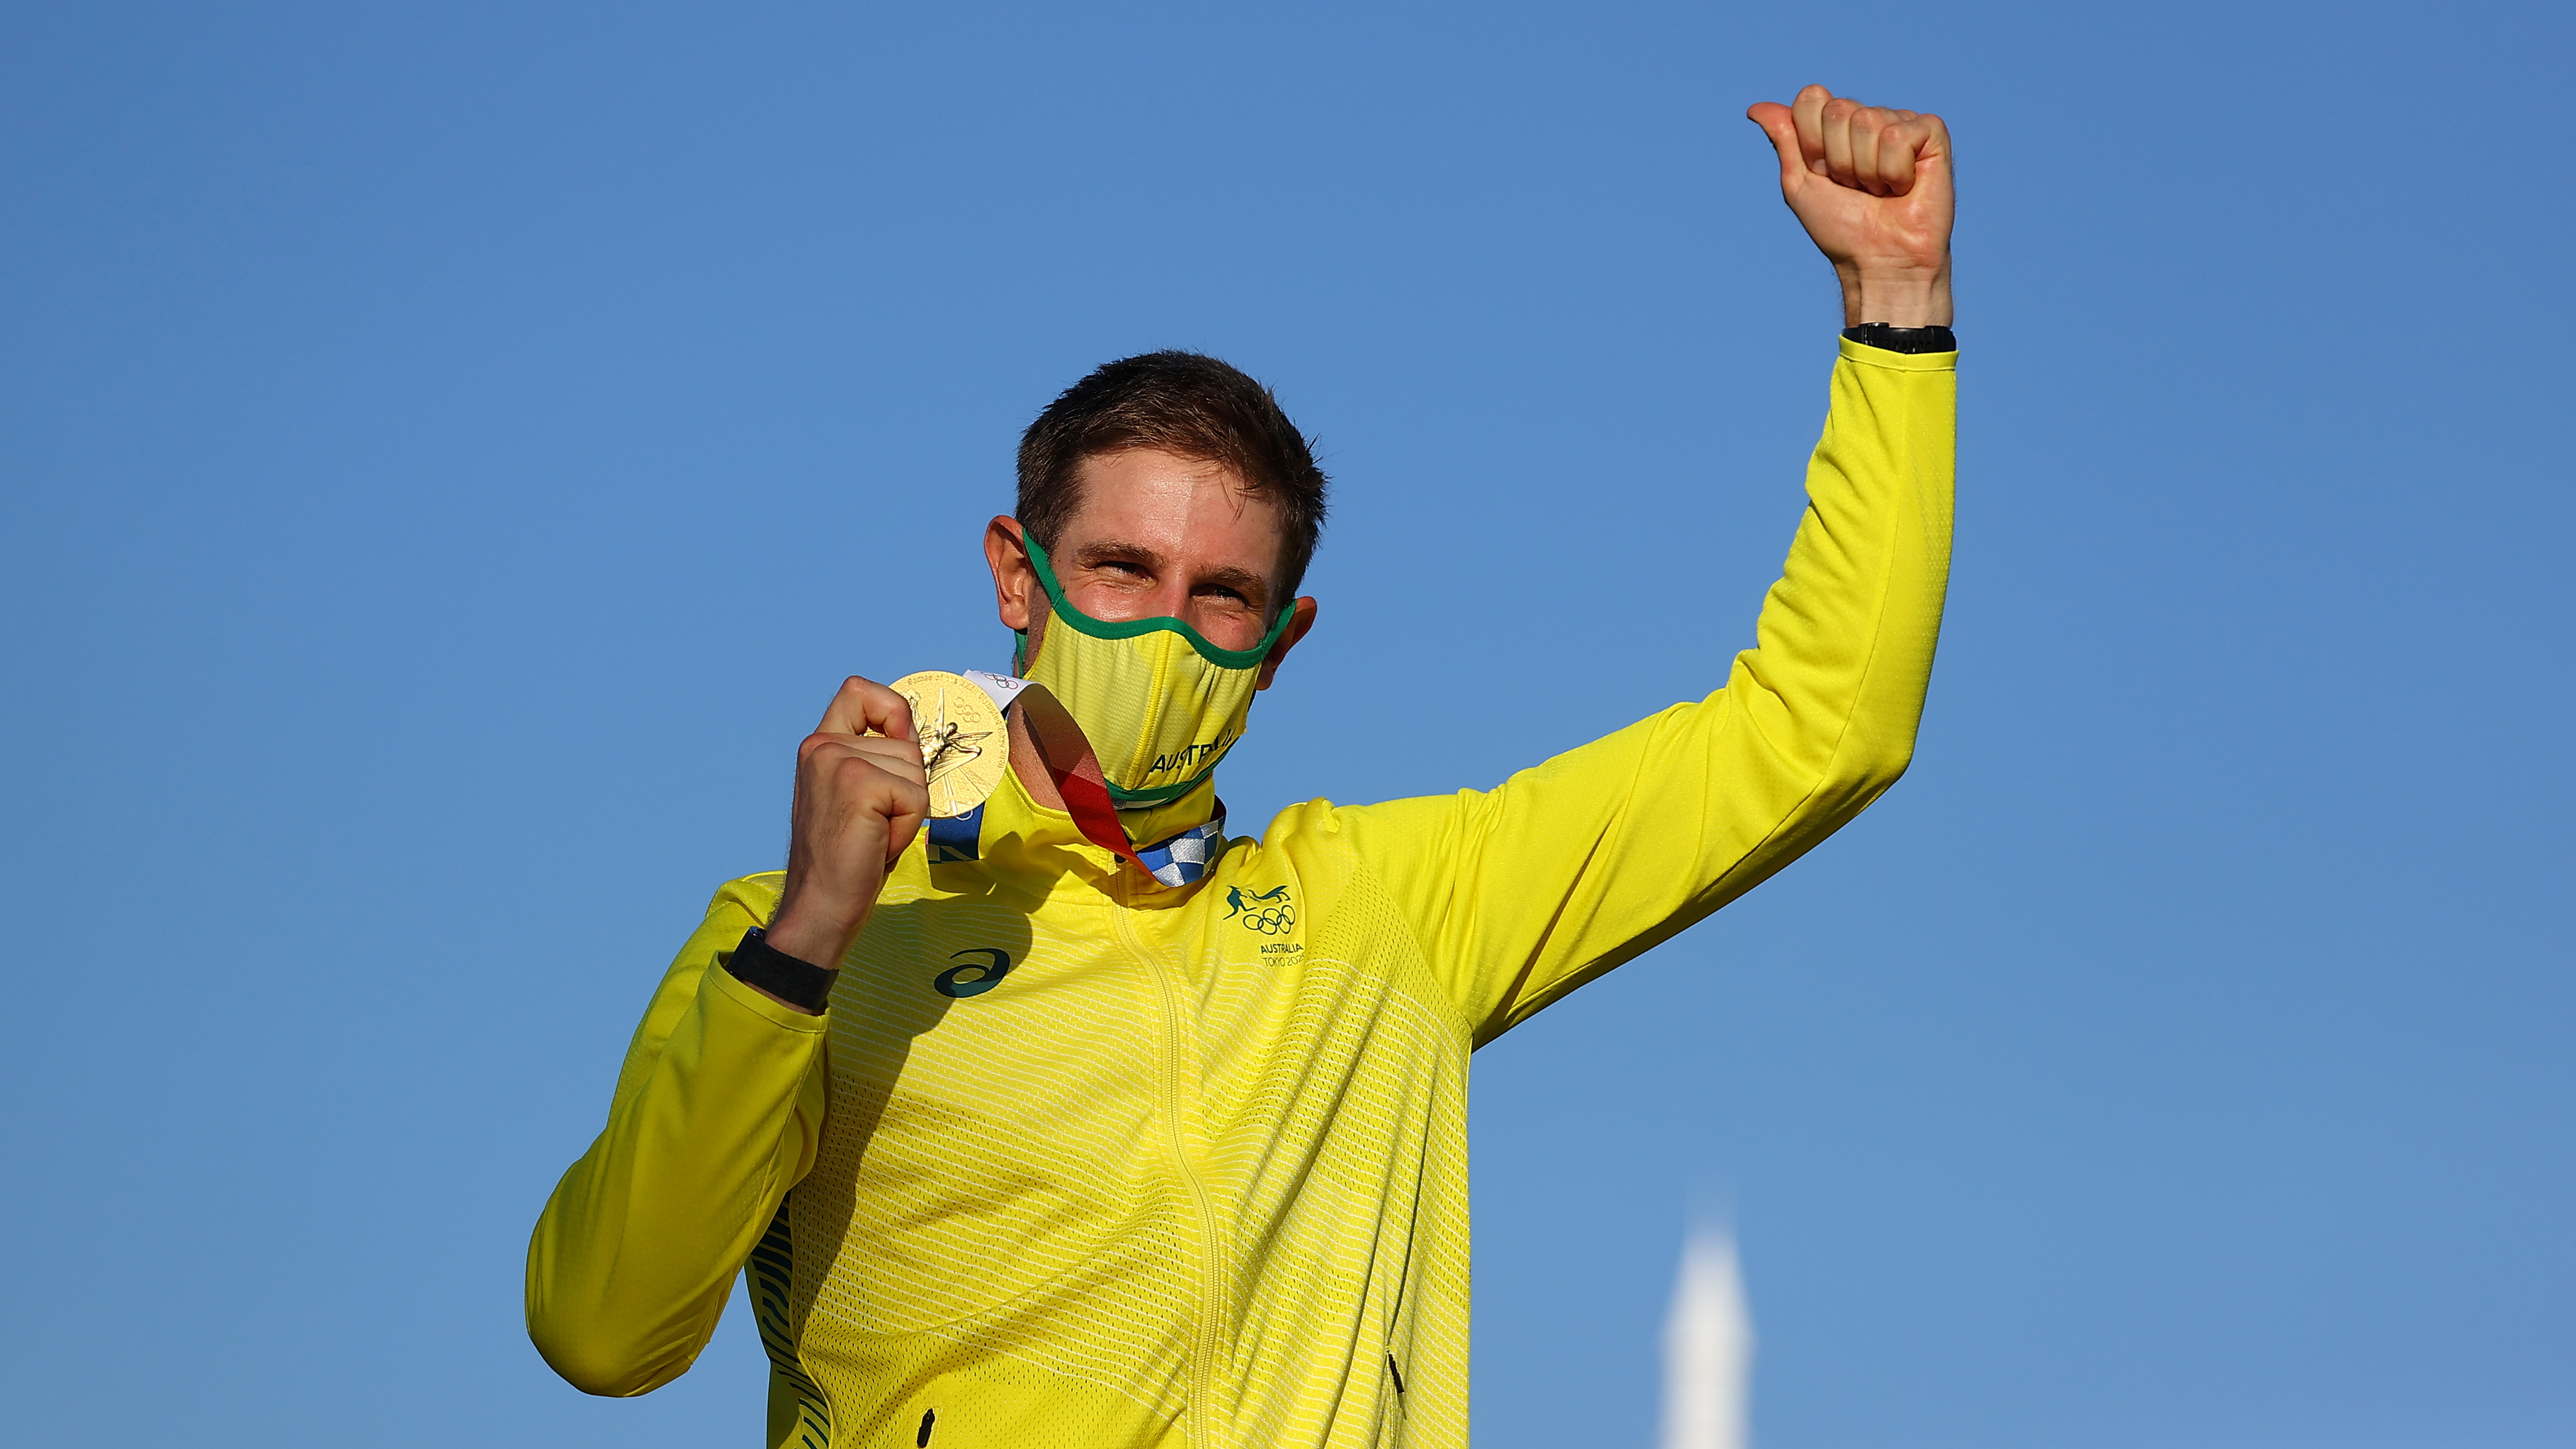 Tokyo 2020 Olympics - Sailing - Men's Laser - Medal Ceremony - Enoshima Yacht Harbour - Tokyo, Japan - August 1, 2021. Gold medallist Matthew Wearn of Australia celebrates on the podium. REUTERS/Carlos Barria